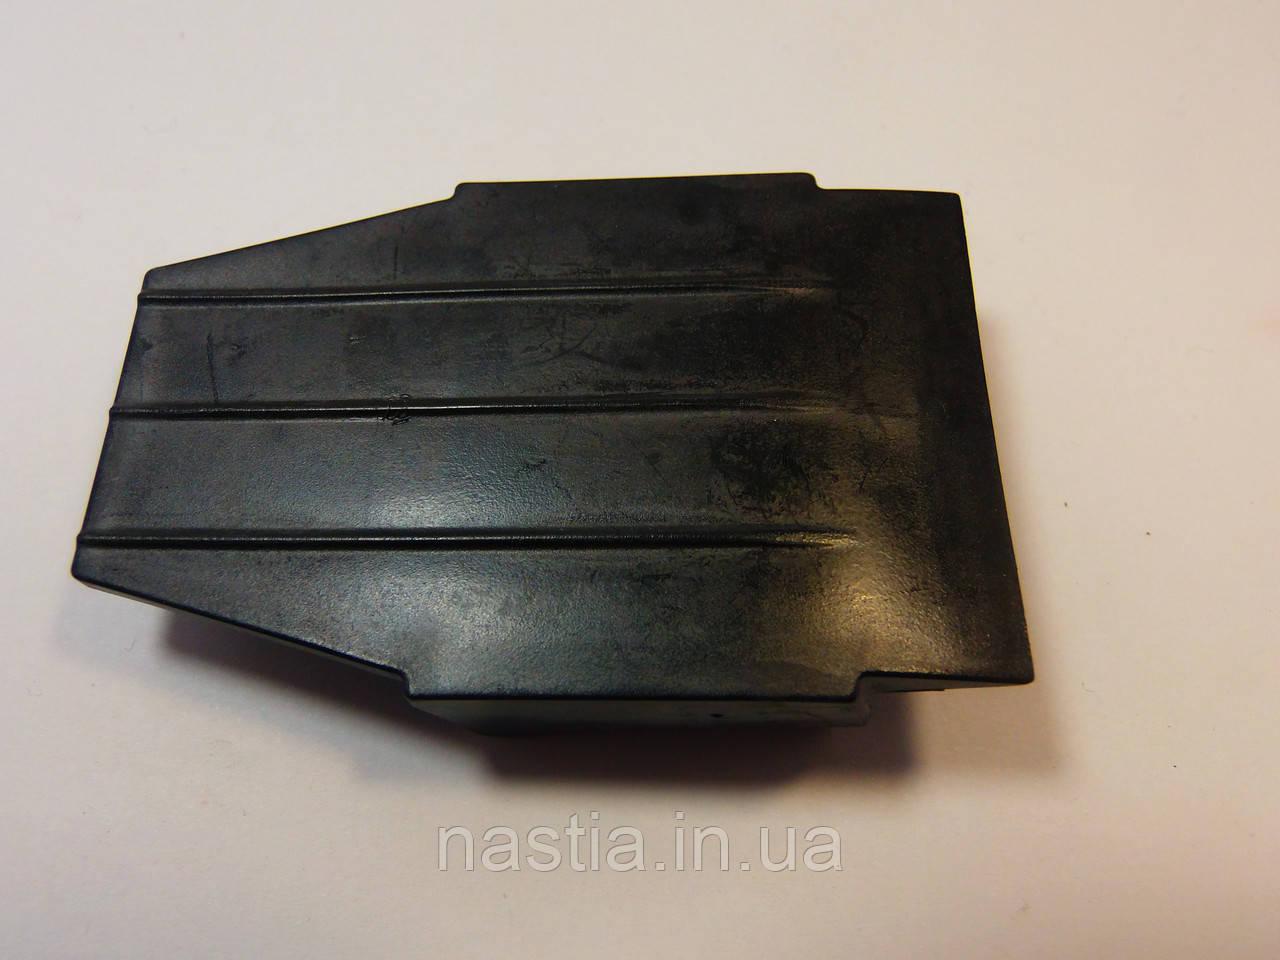 17000663 Направляюча для скидання жмиху рабочого блоку, Royal Gran Crema